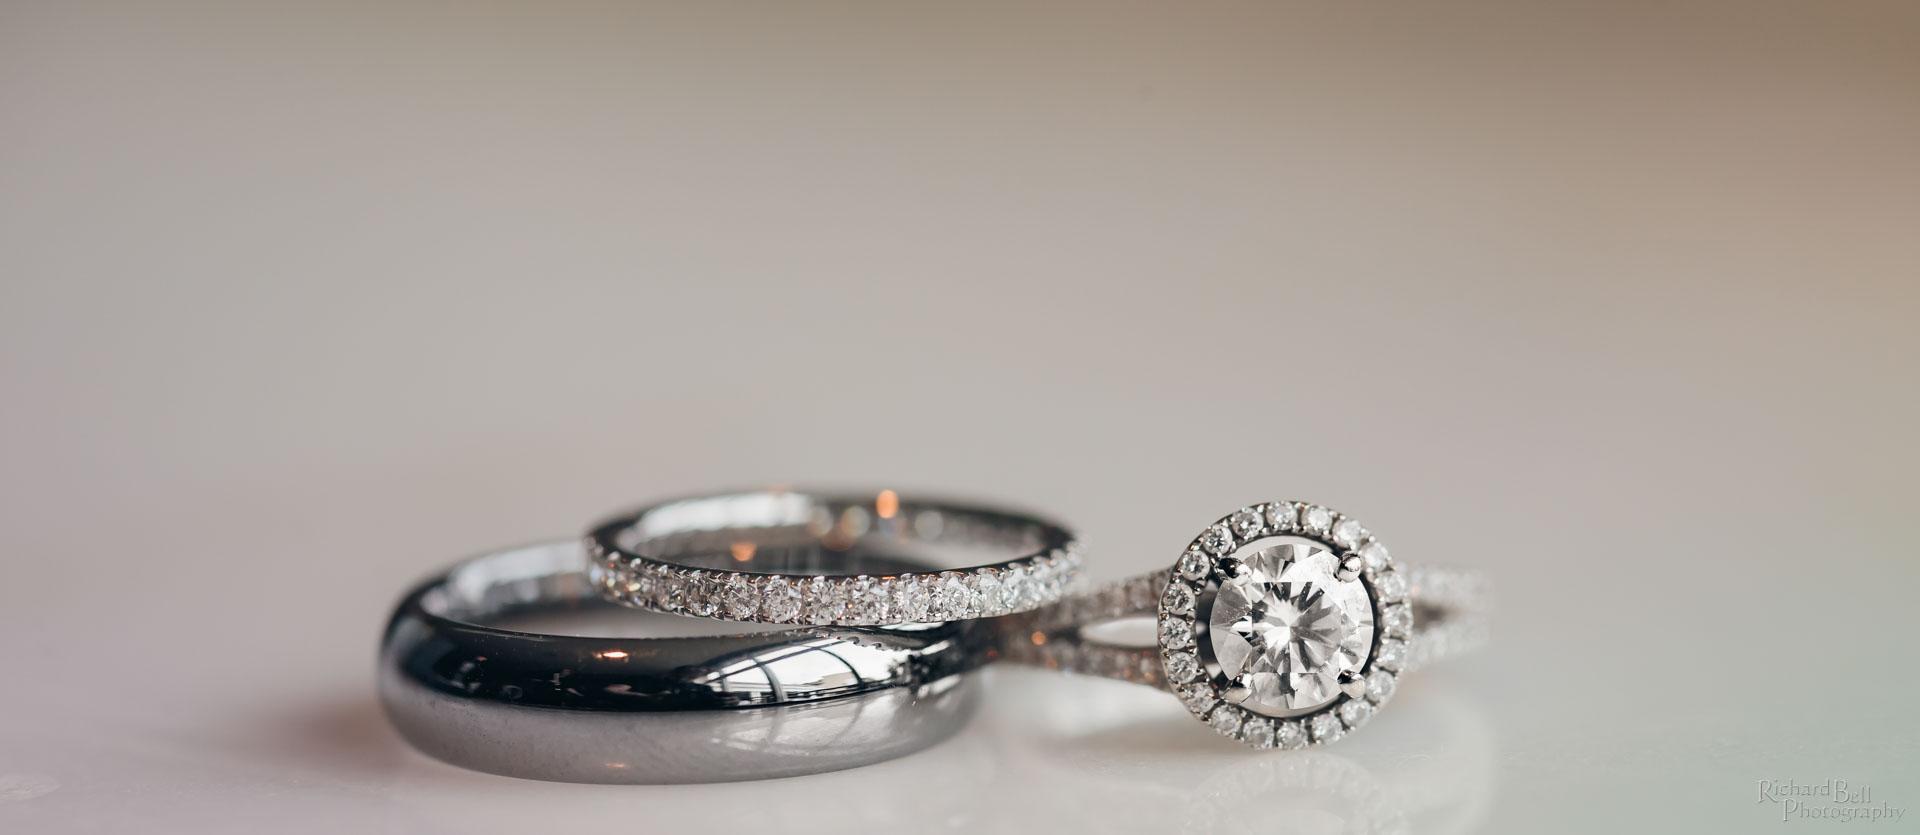 Fitzpatrick Rings